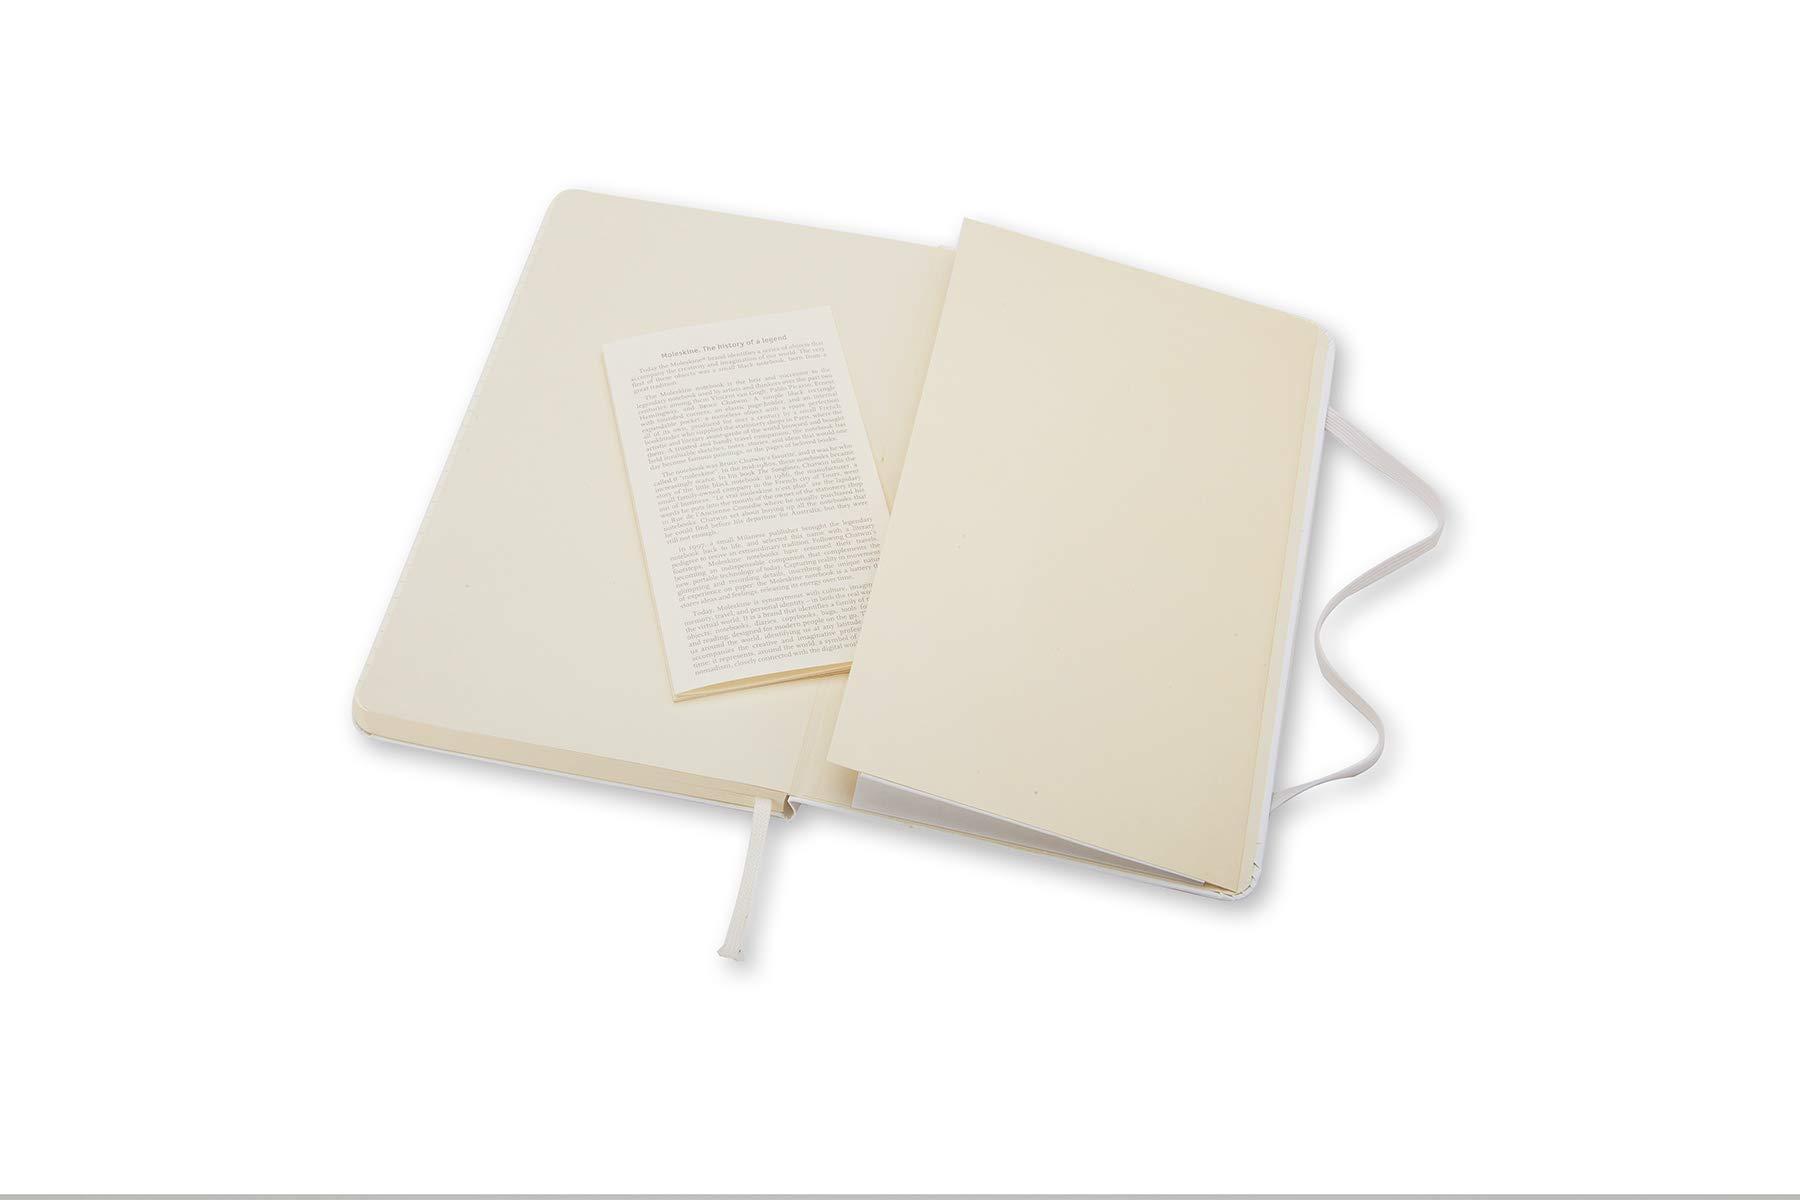 Moleskine Classic Notebook, Hard Cover, Large (5'' x 8.25'') Ruled/Lined, White by Moleskine (Image #5)